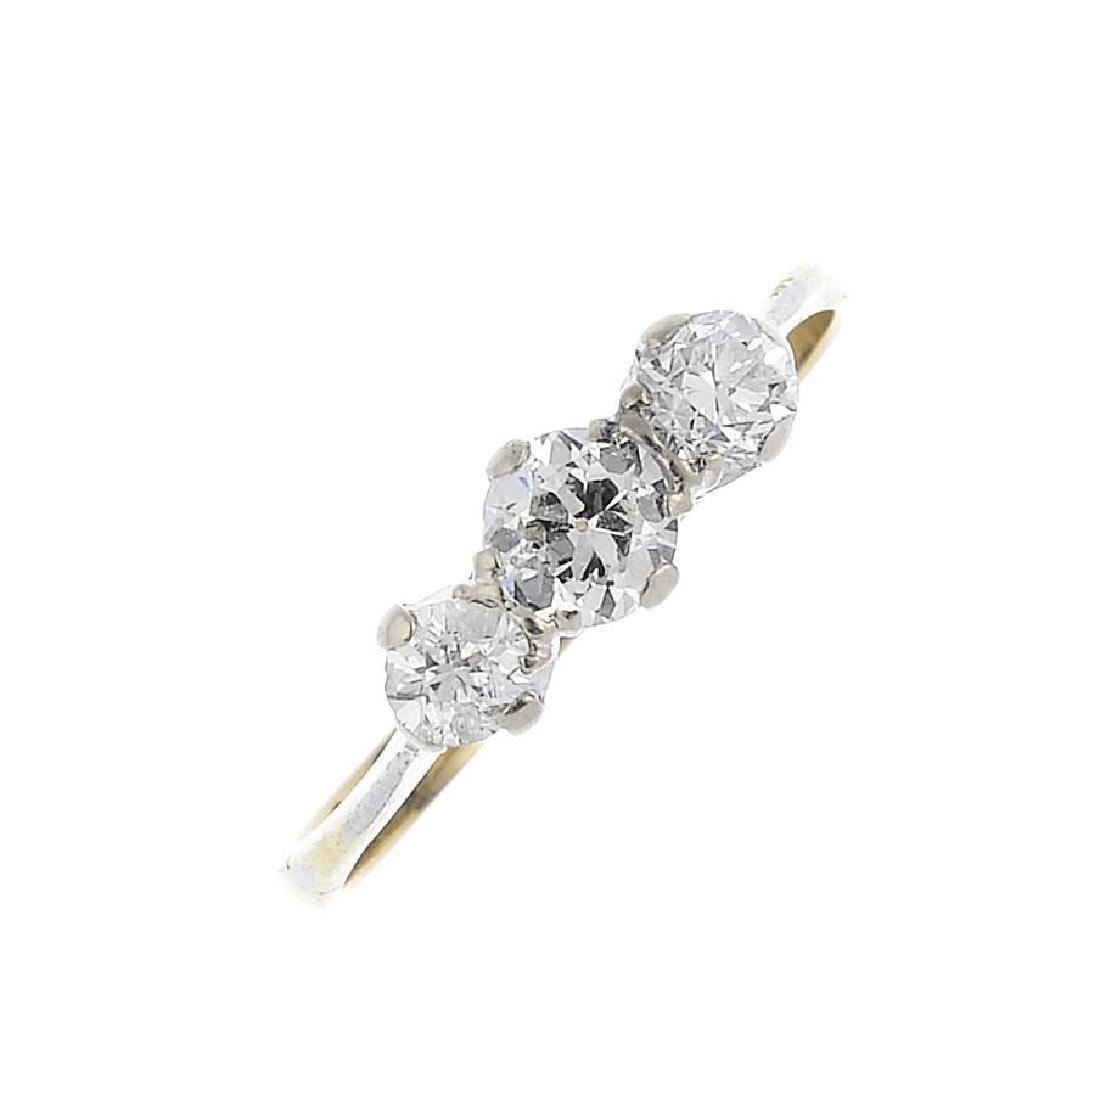 A diamond three-stone ring. The slightly graduated